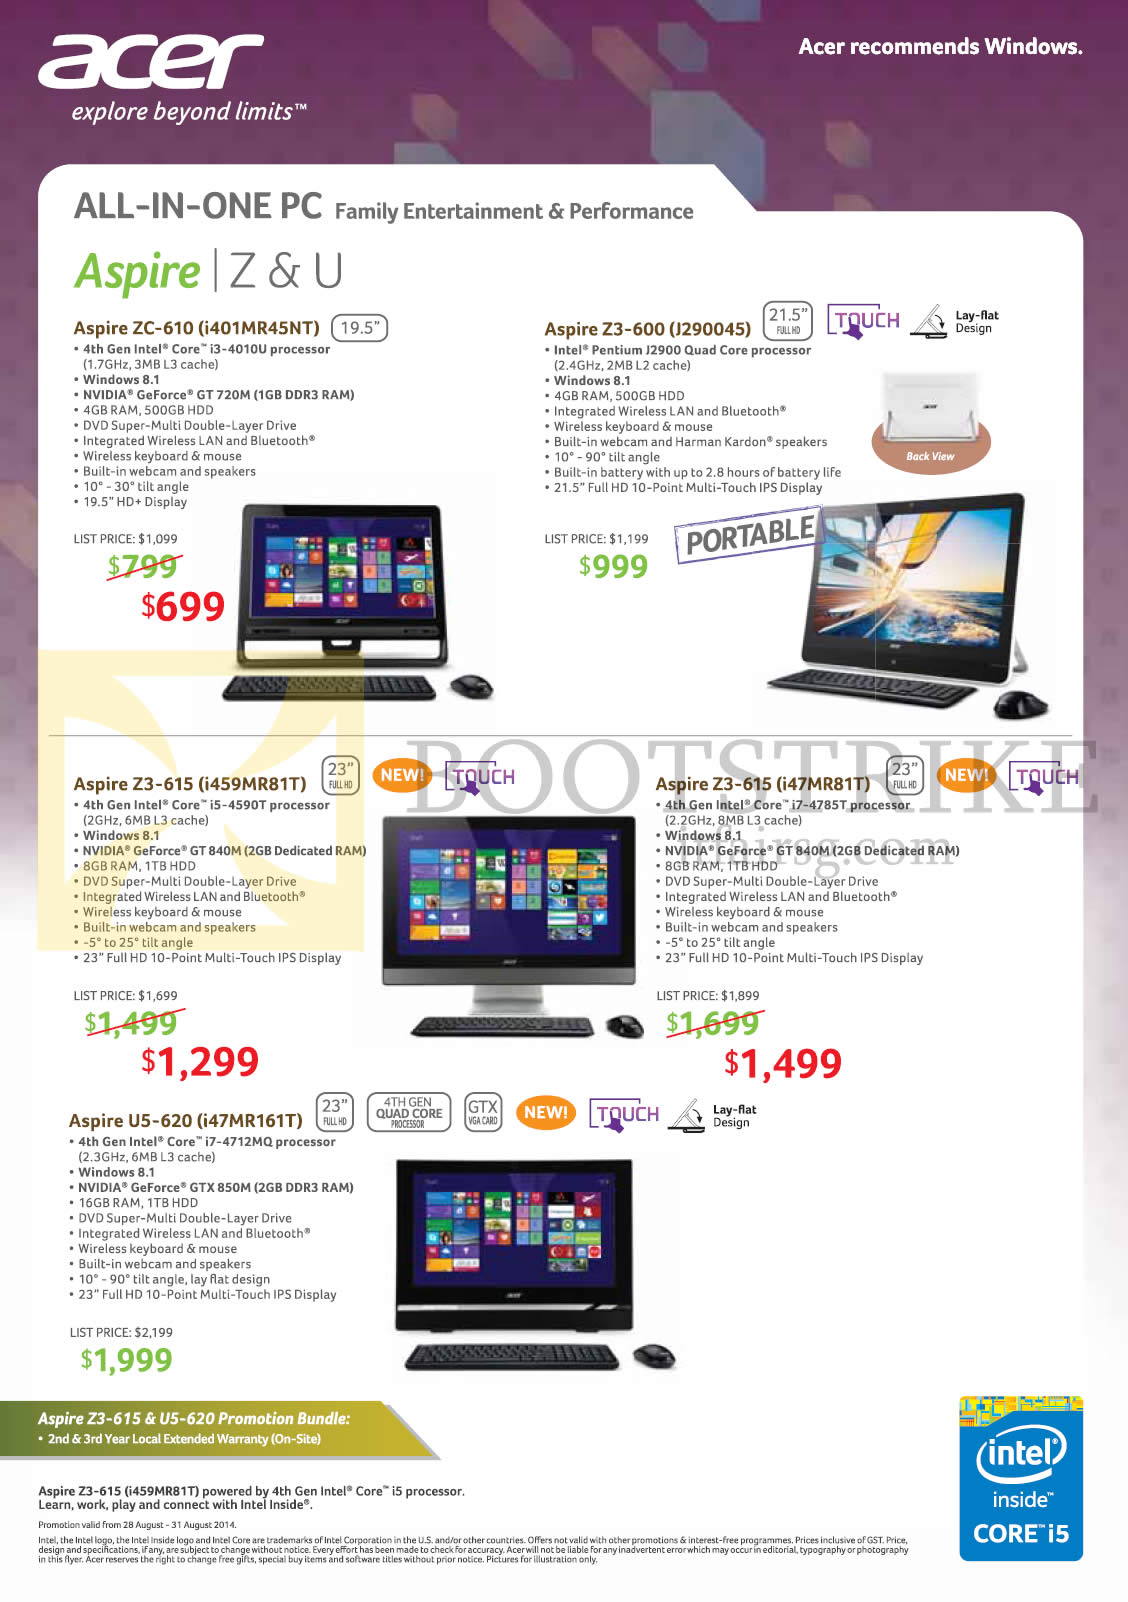 COMEX 2014 price list image brochure of Acer AIO Desktop PCs Aspire ZC-610, Z3-600, Z3-615, U5-620